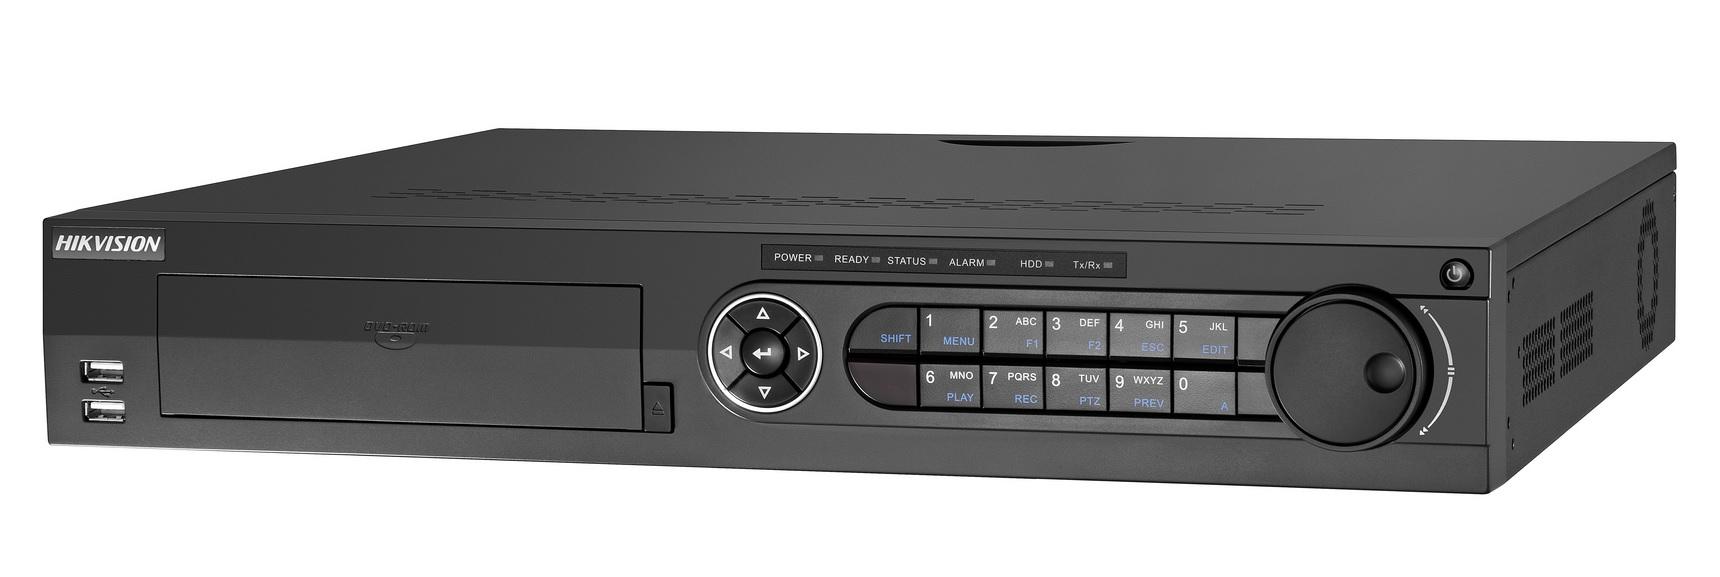 HIKVISION DS-7324HUHI-K4 Καταγραφικό HDTVI έως 8MP